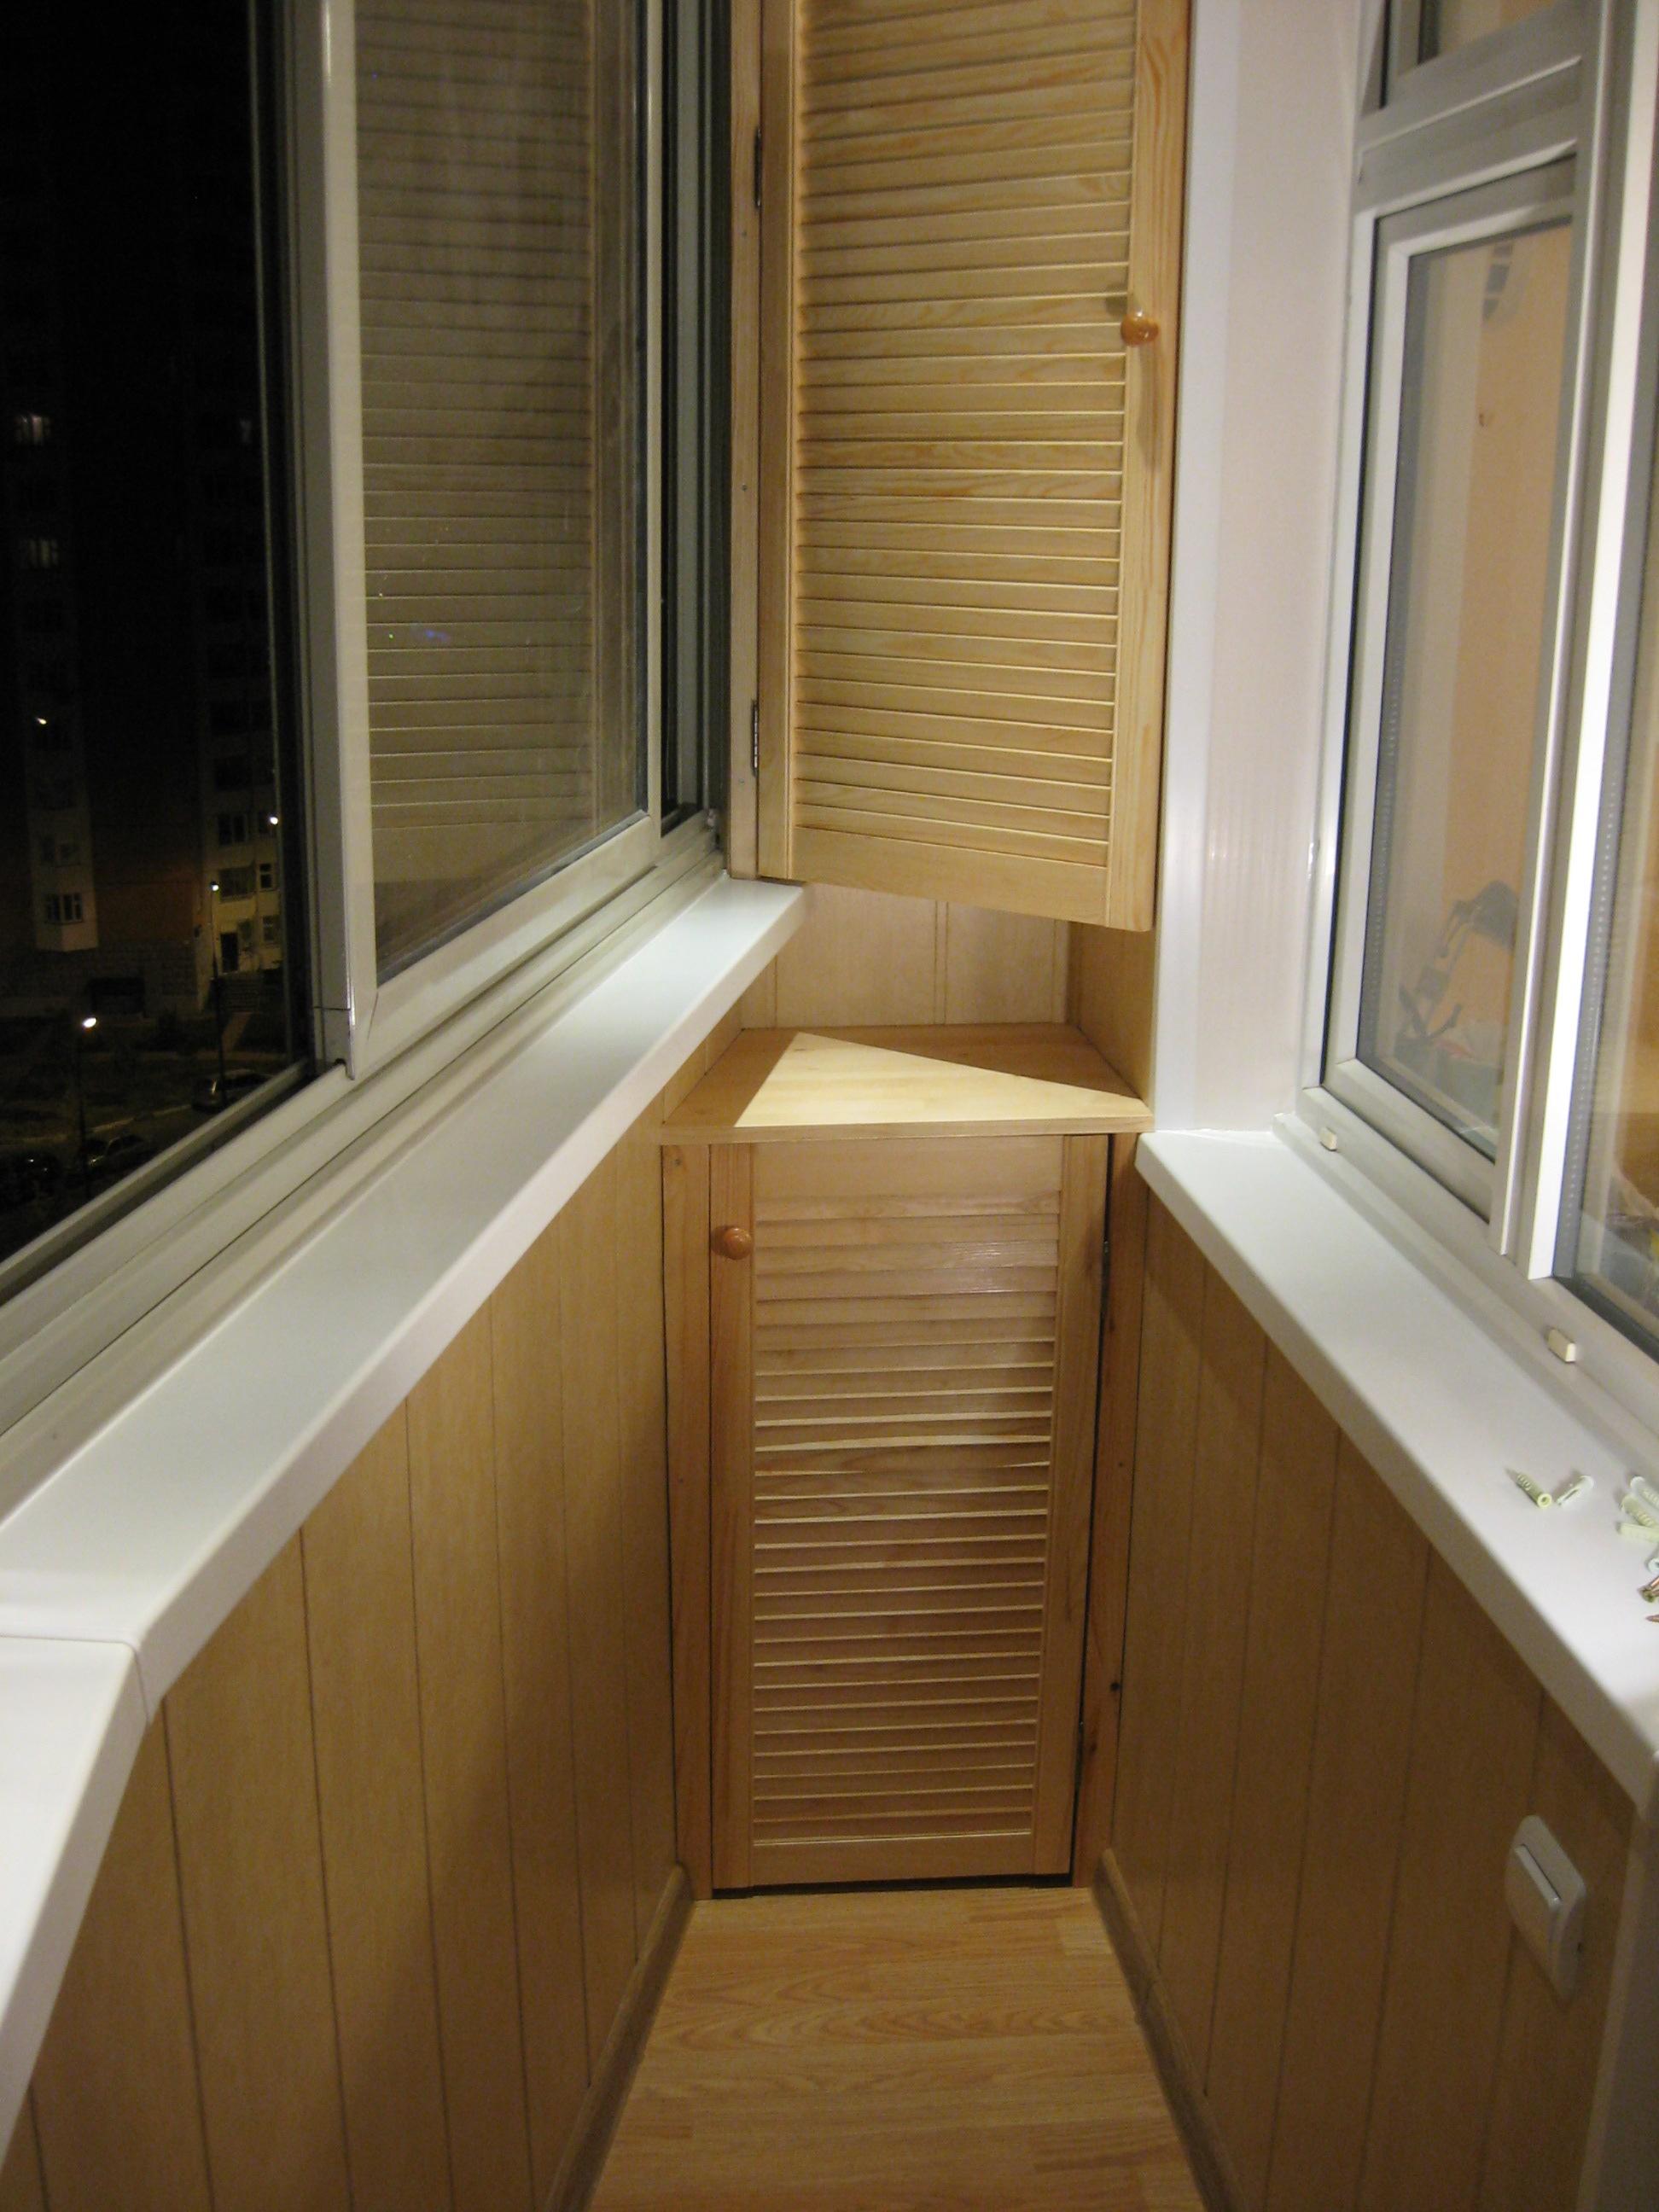 Шкафы, тумбы, стелажи на балконе лоджии.